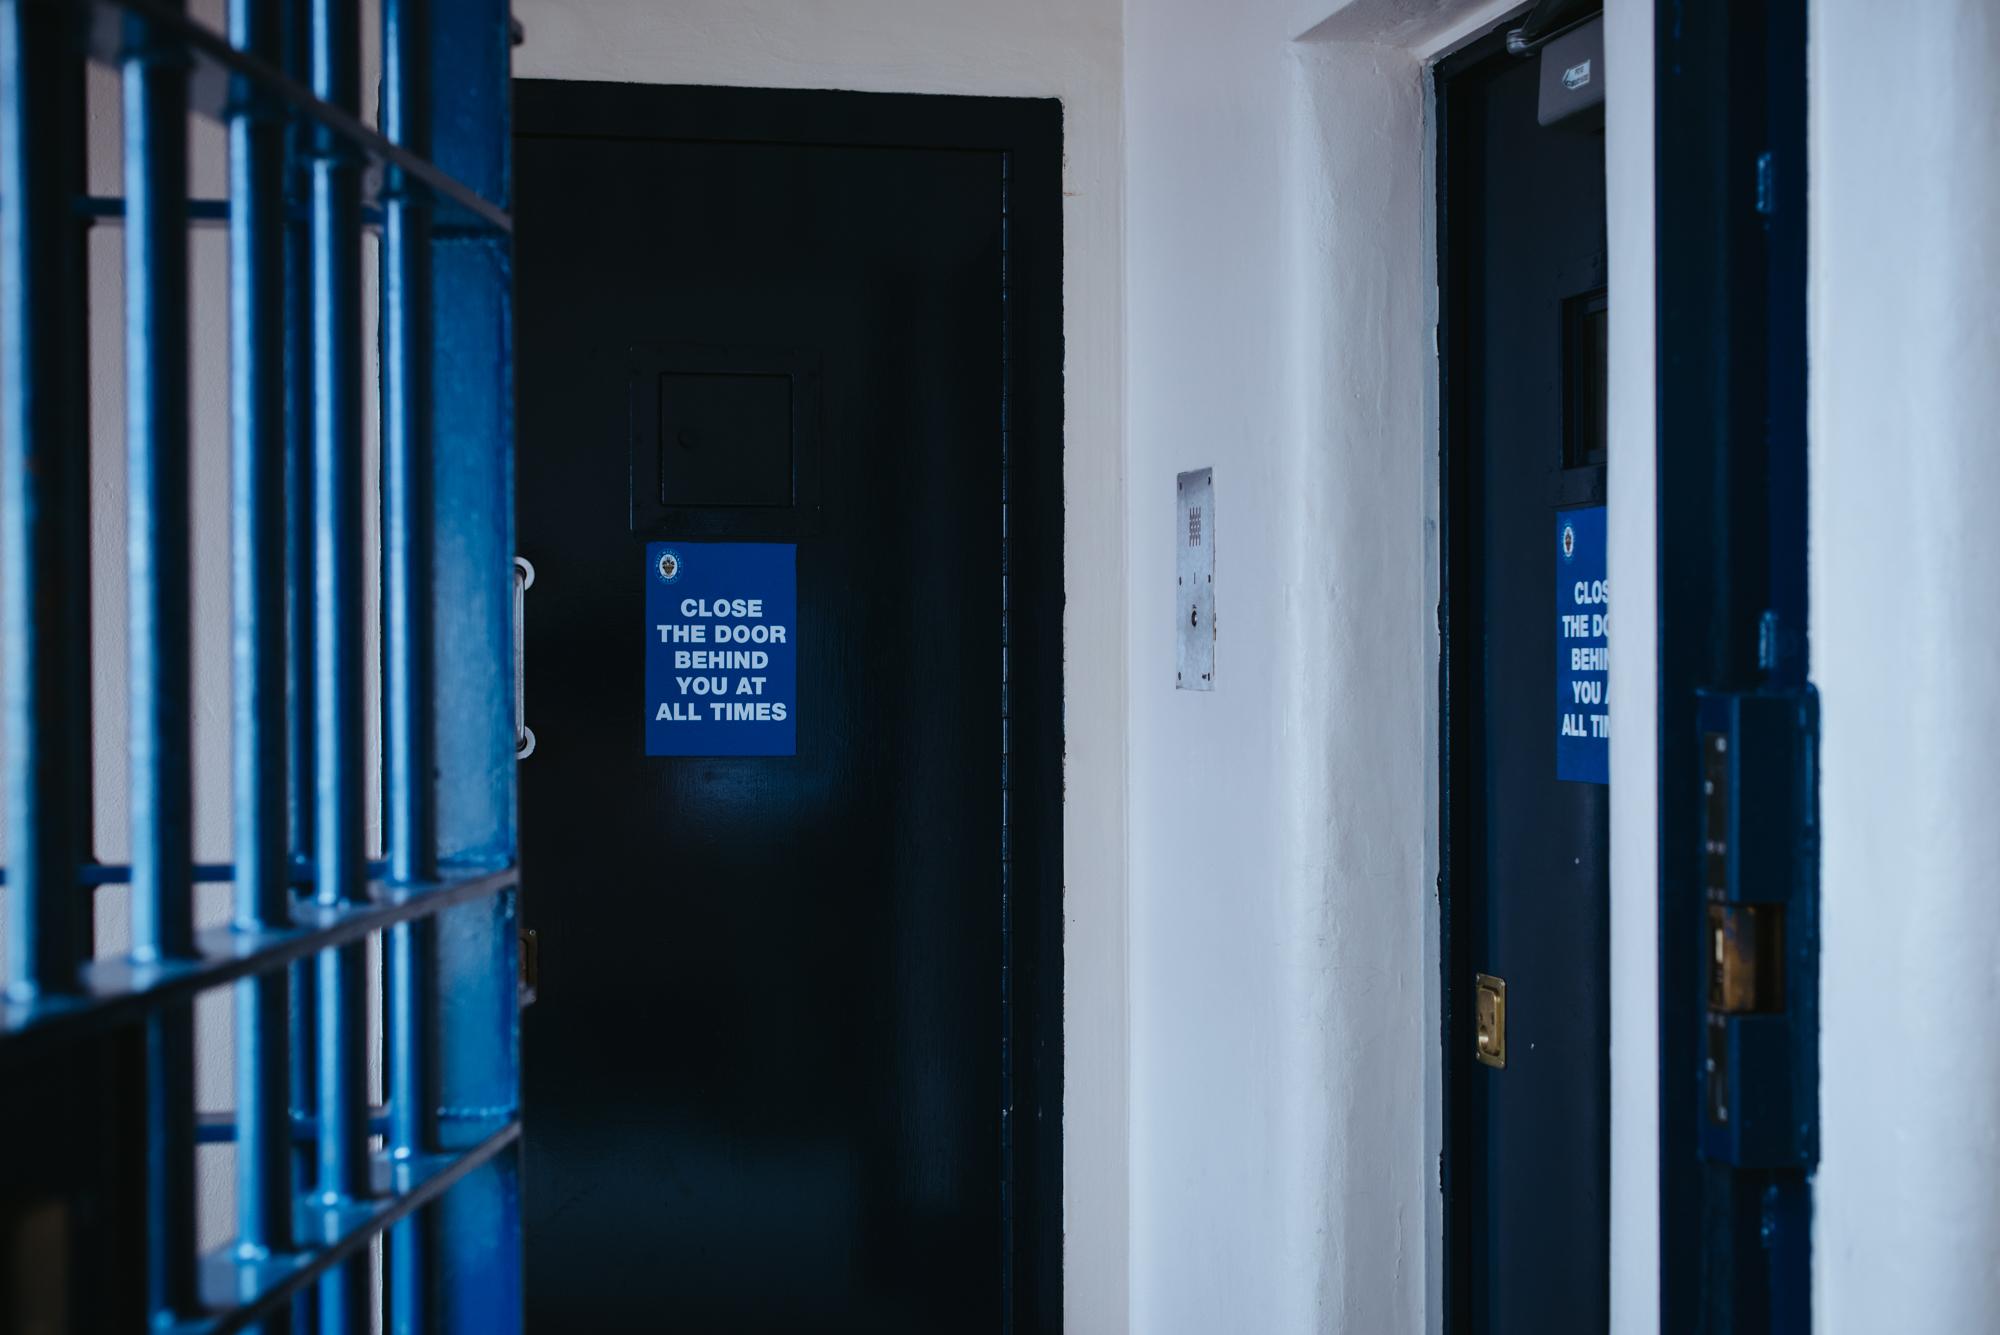 Steelhouse-Lane-Lock-Up-Birmingham-Hanny-Foxhall-_DSC1162.jpg